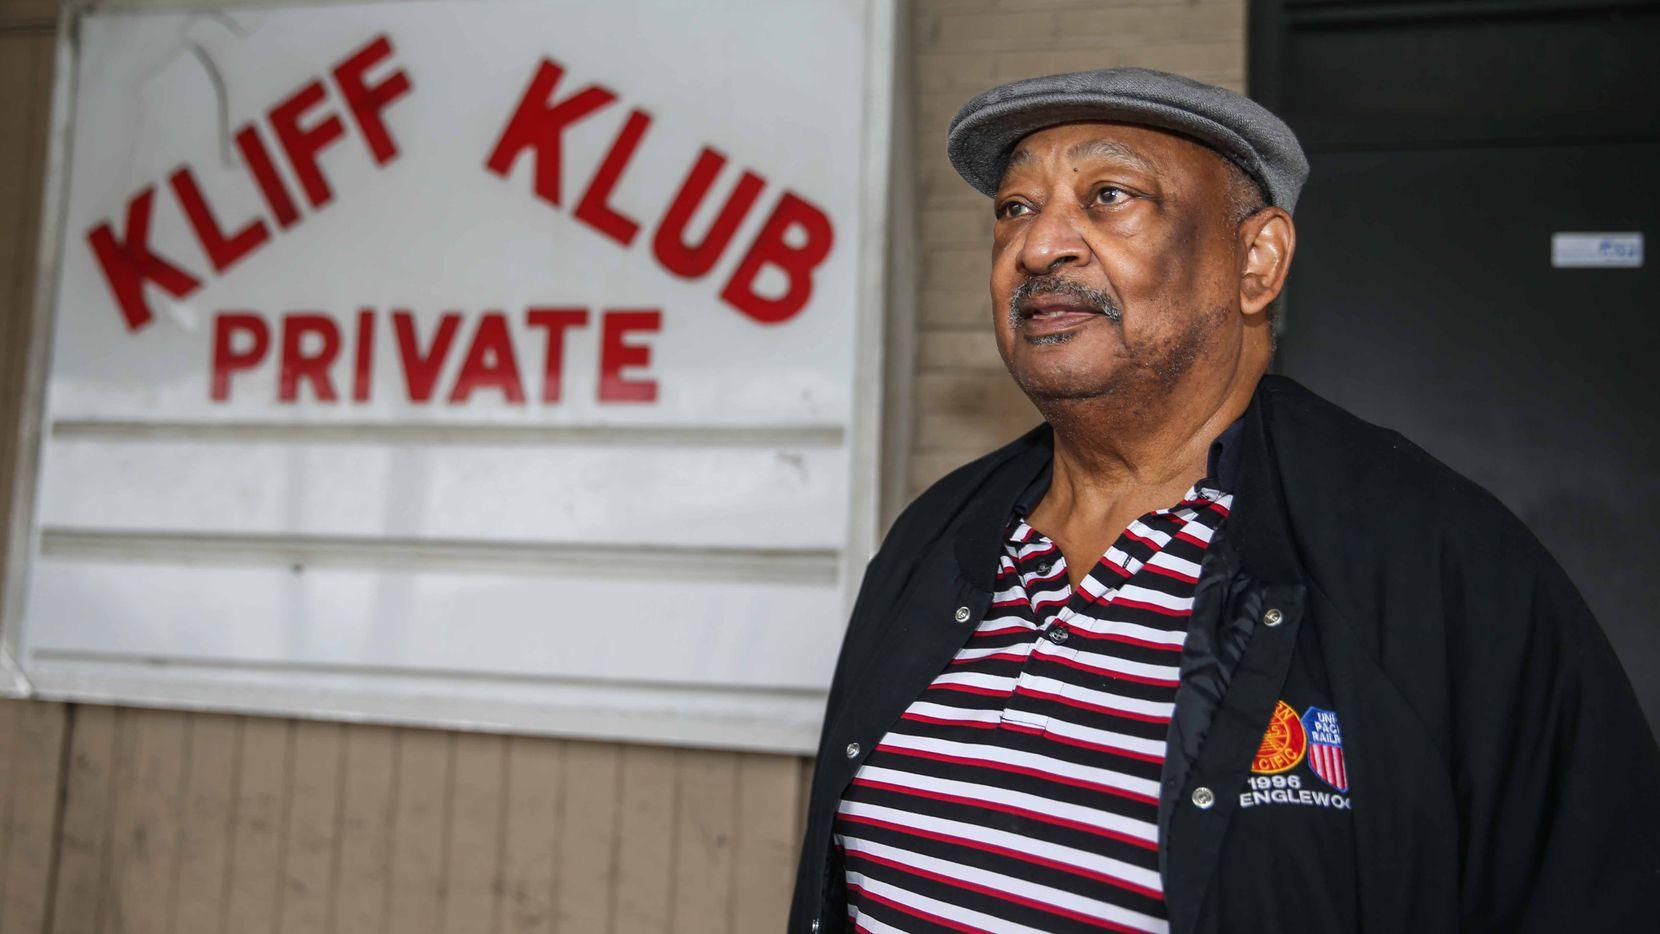 Owner Bill Frazier poses outside the Kliff Klub on Wednesday.